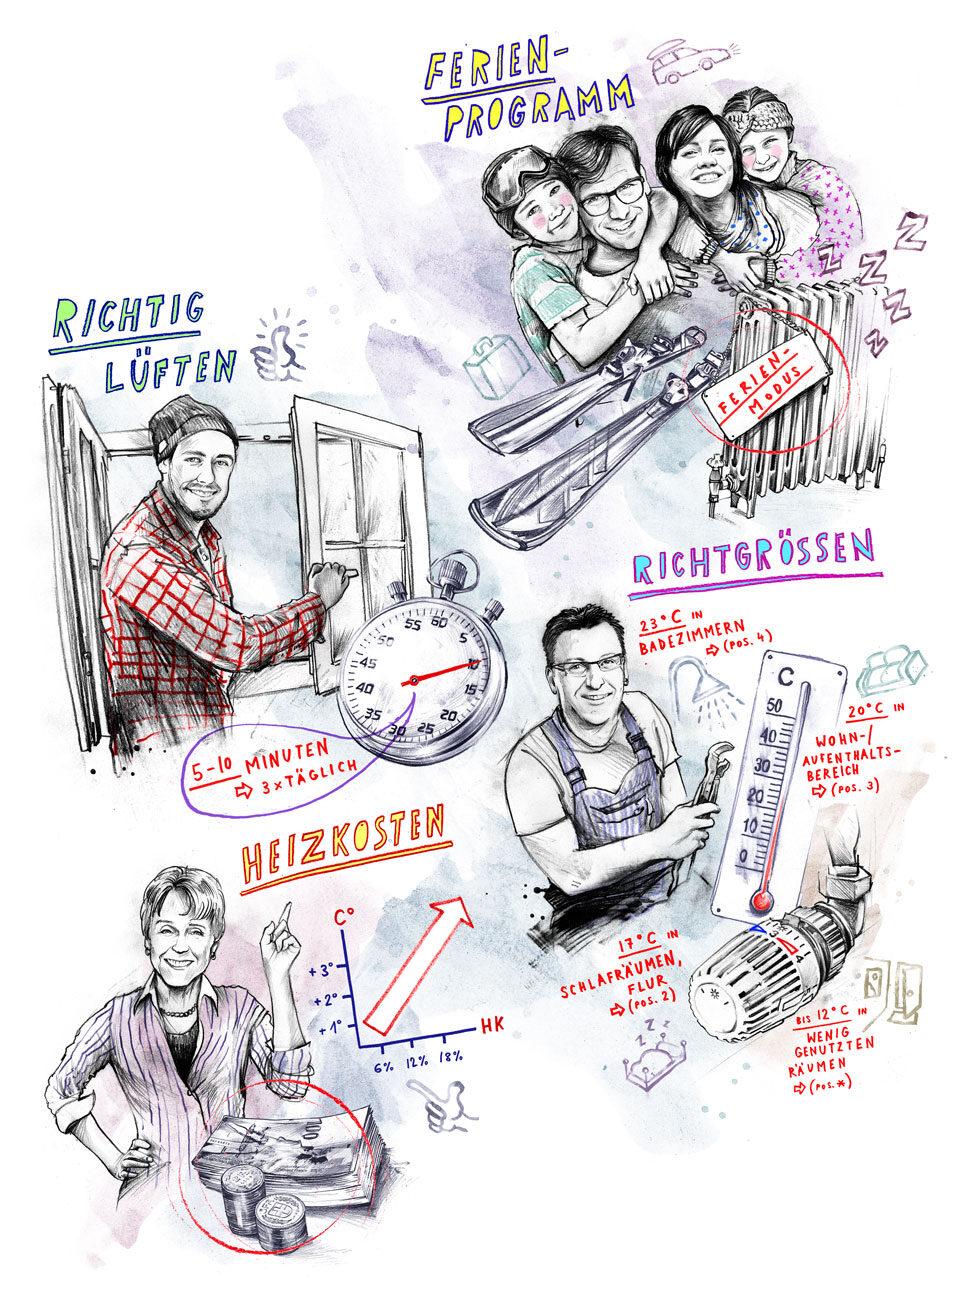 ERZ 1 - Kornel Illustration | Kornel Stadler portfolio